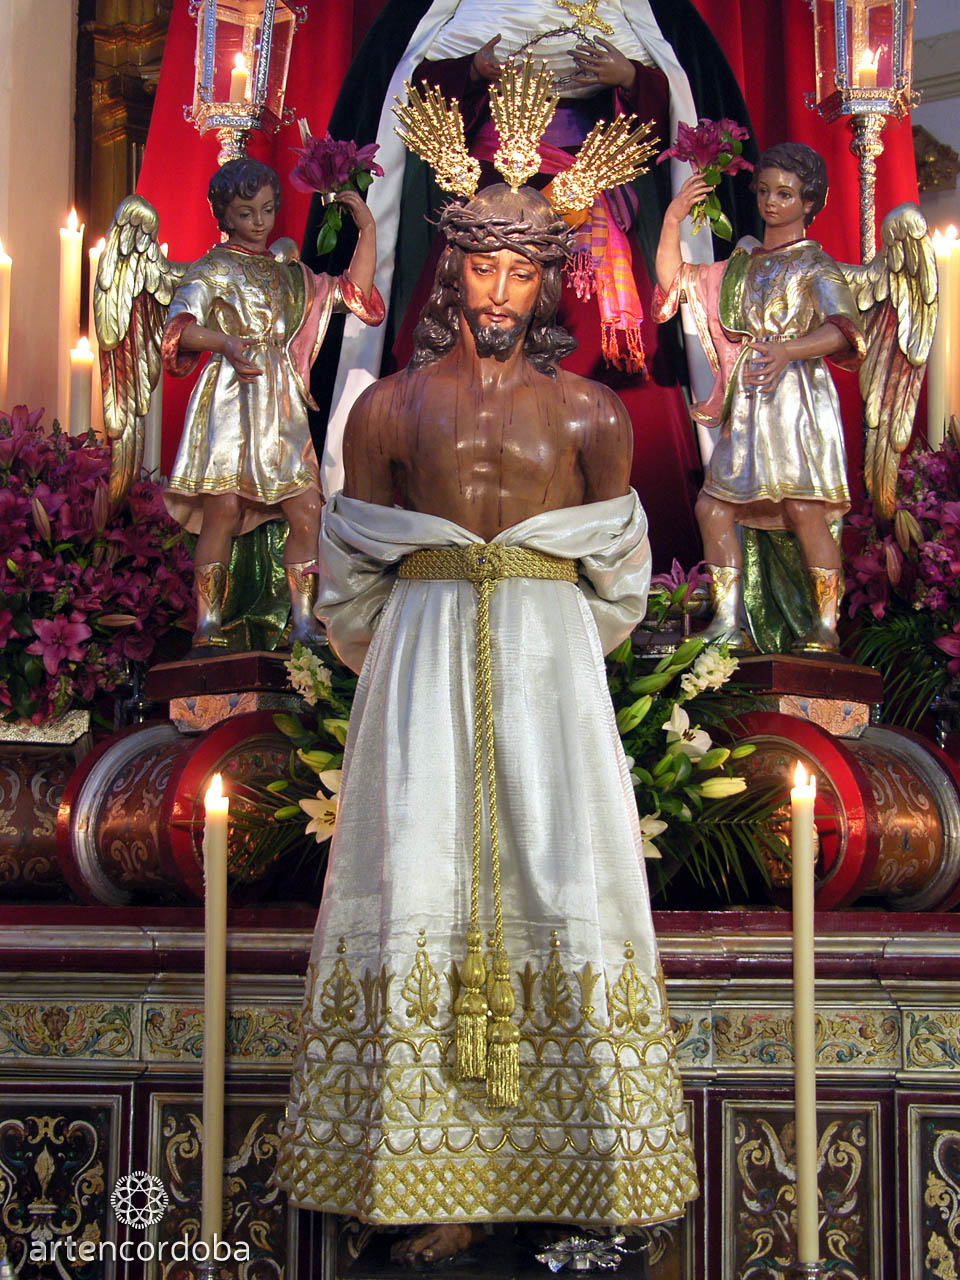 Nuestro Padre Jesús de las Penas - Hermandad de la Esperanza de Córdoba